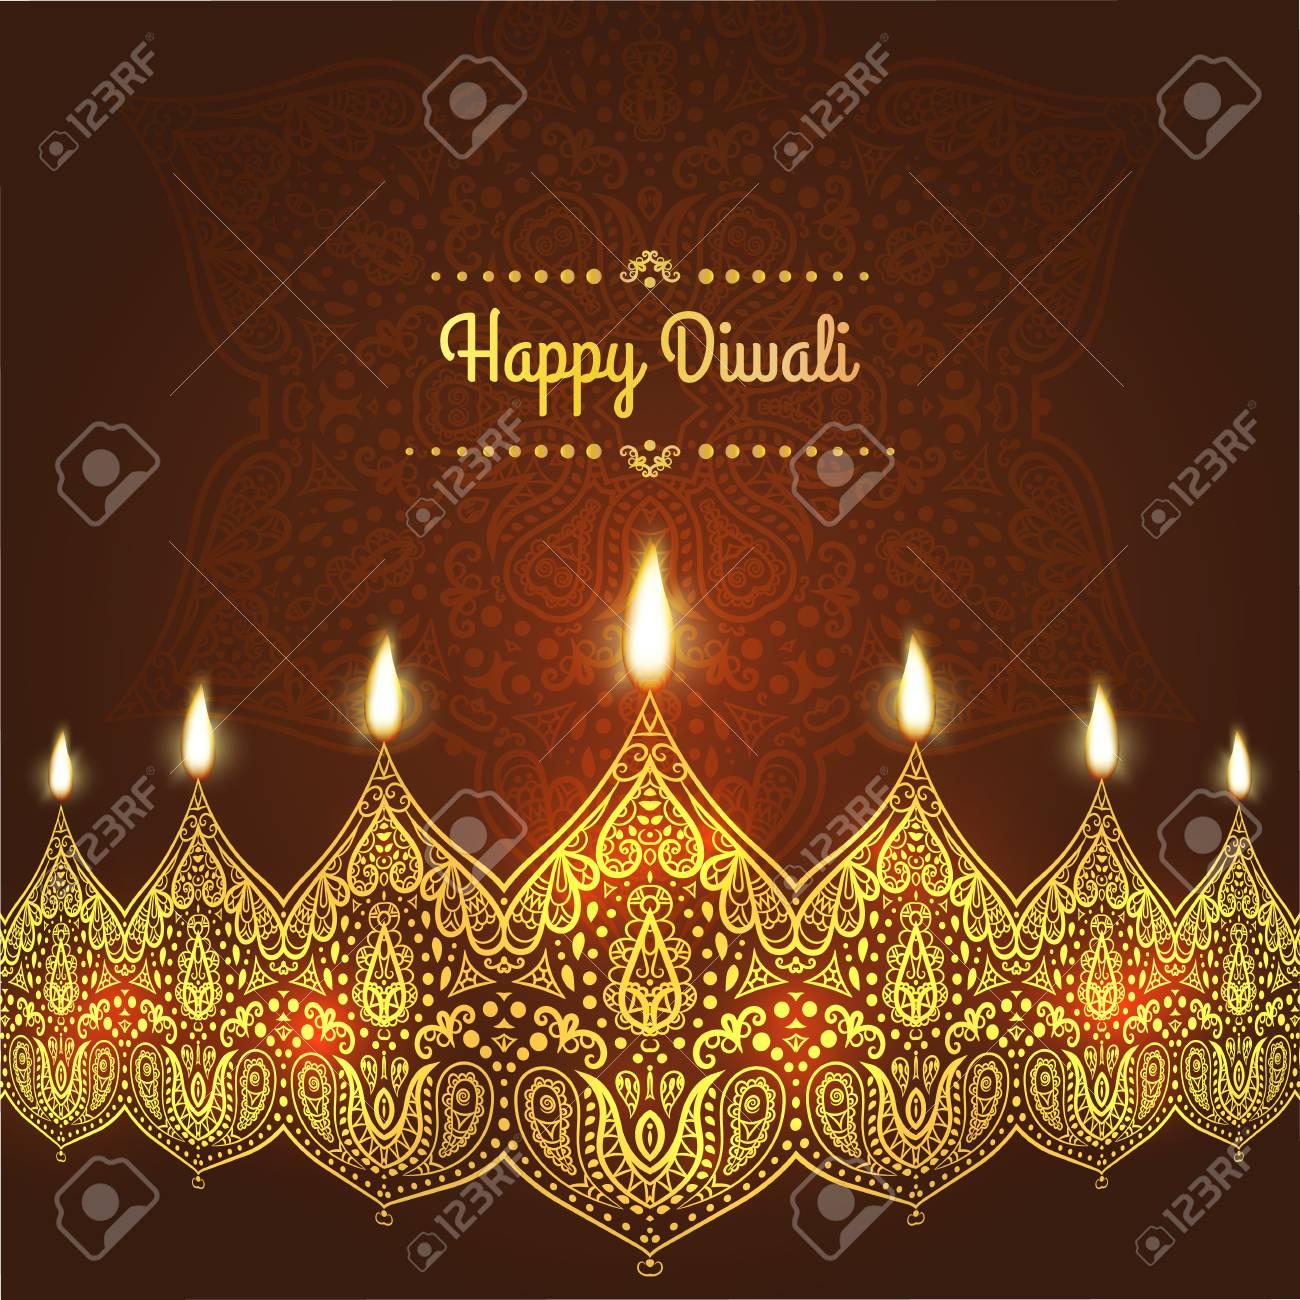 Happy Diwali Greeting Card Design For Diwali Festival With